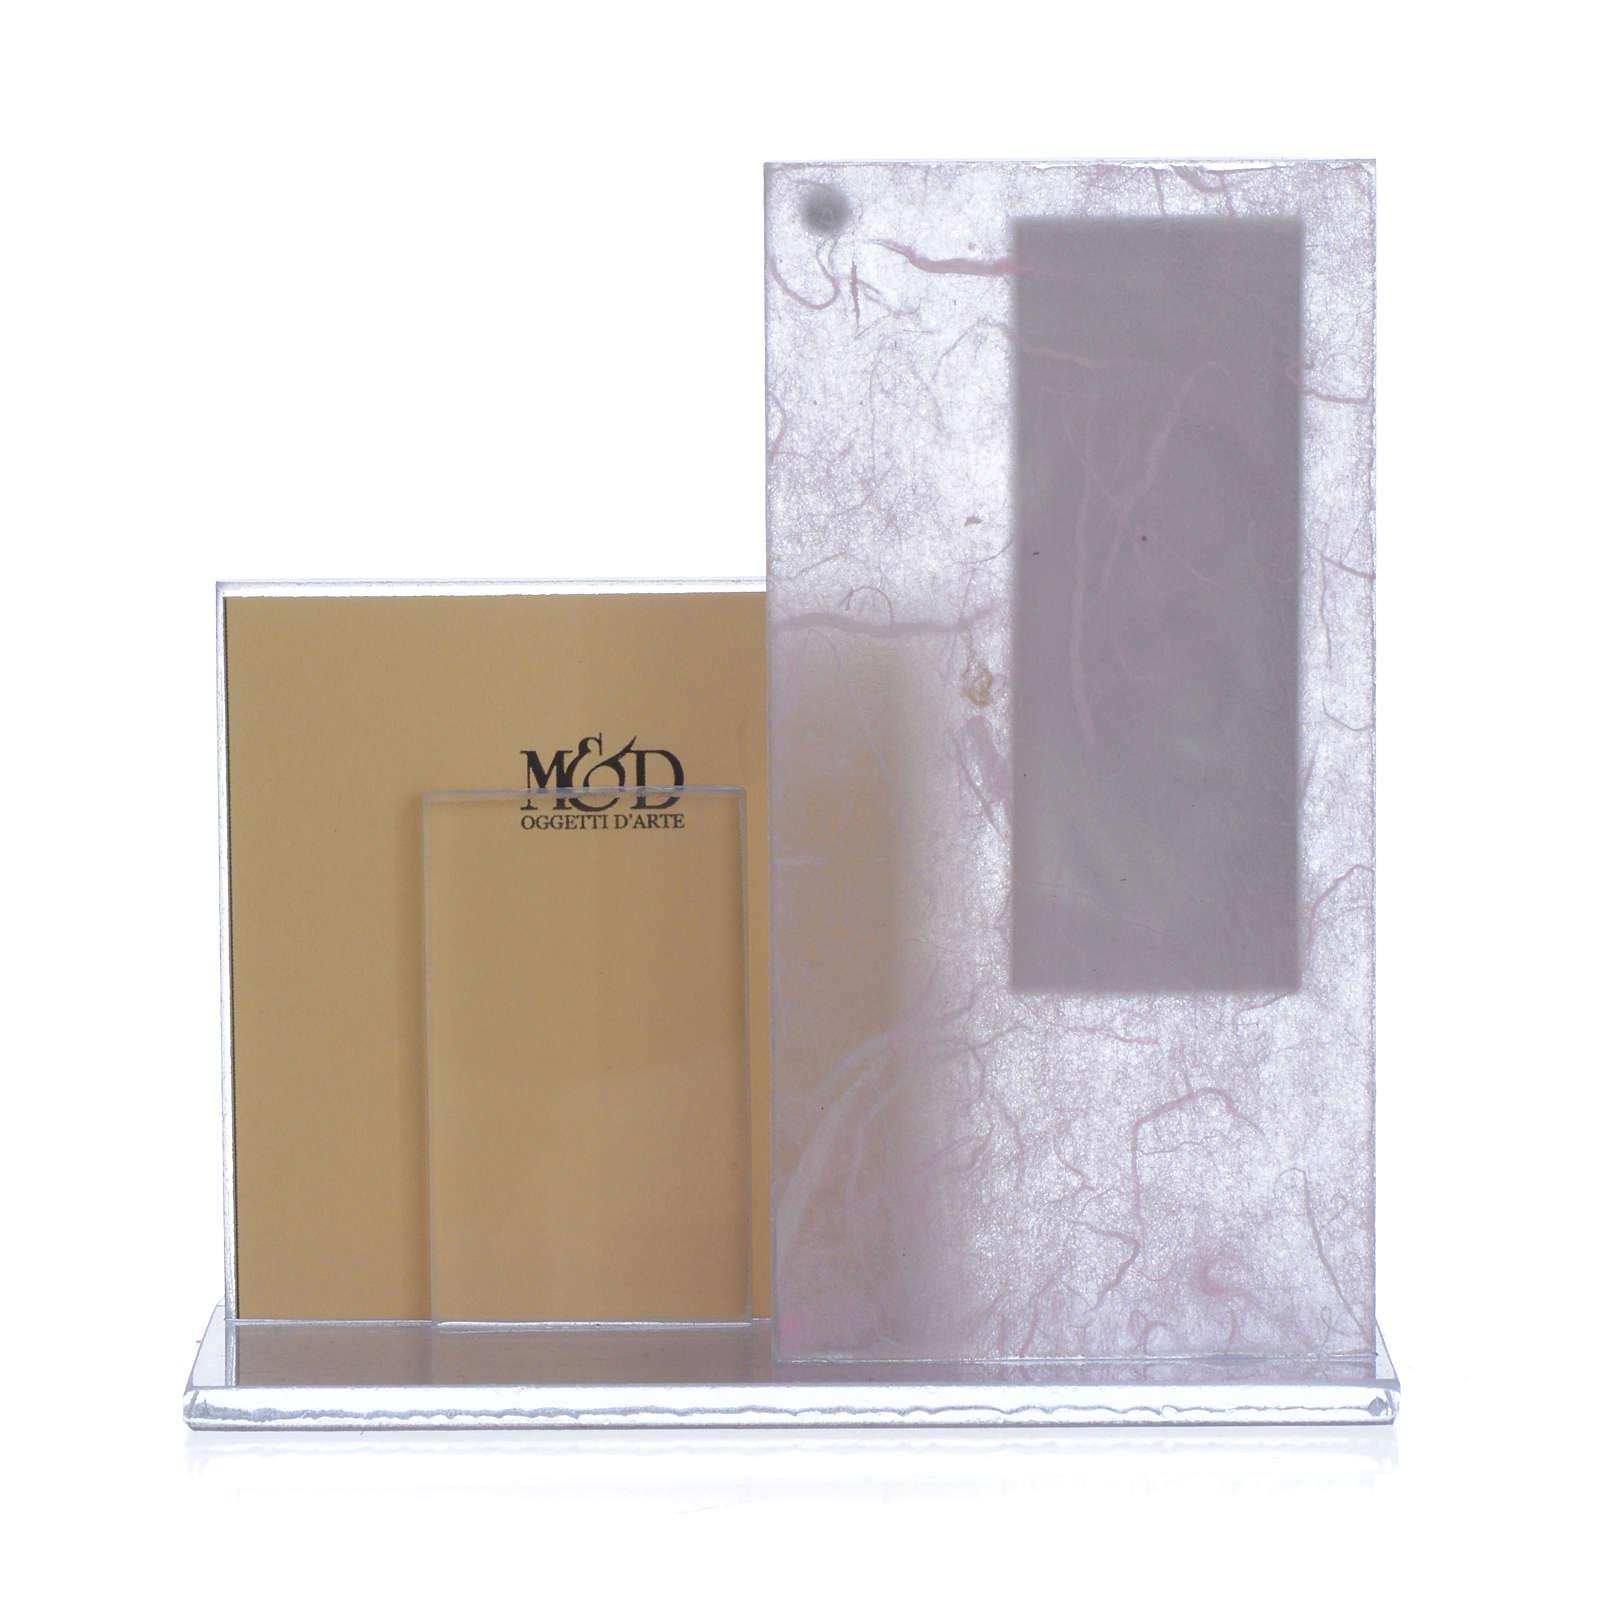 Cuadro con Portarretrato realizado con lámina en plata 3